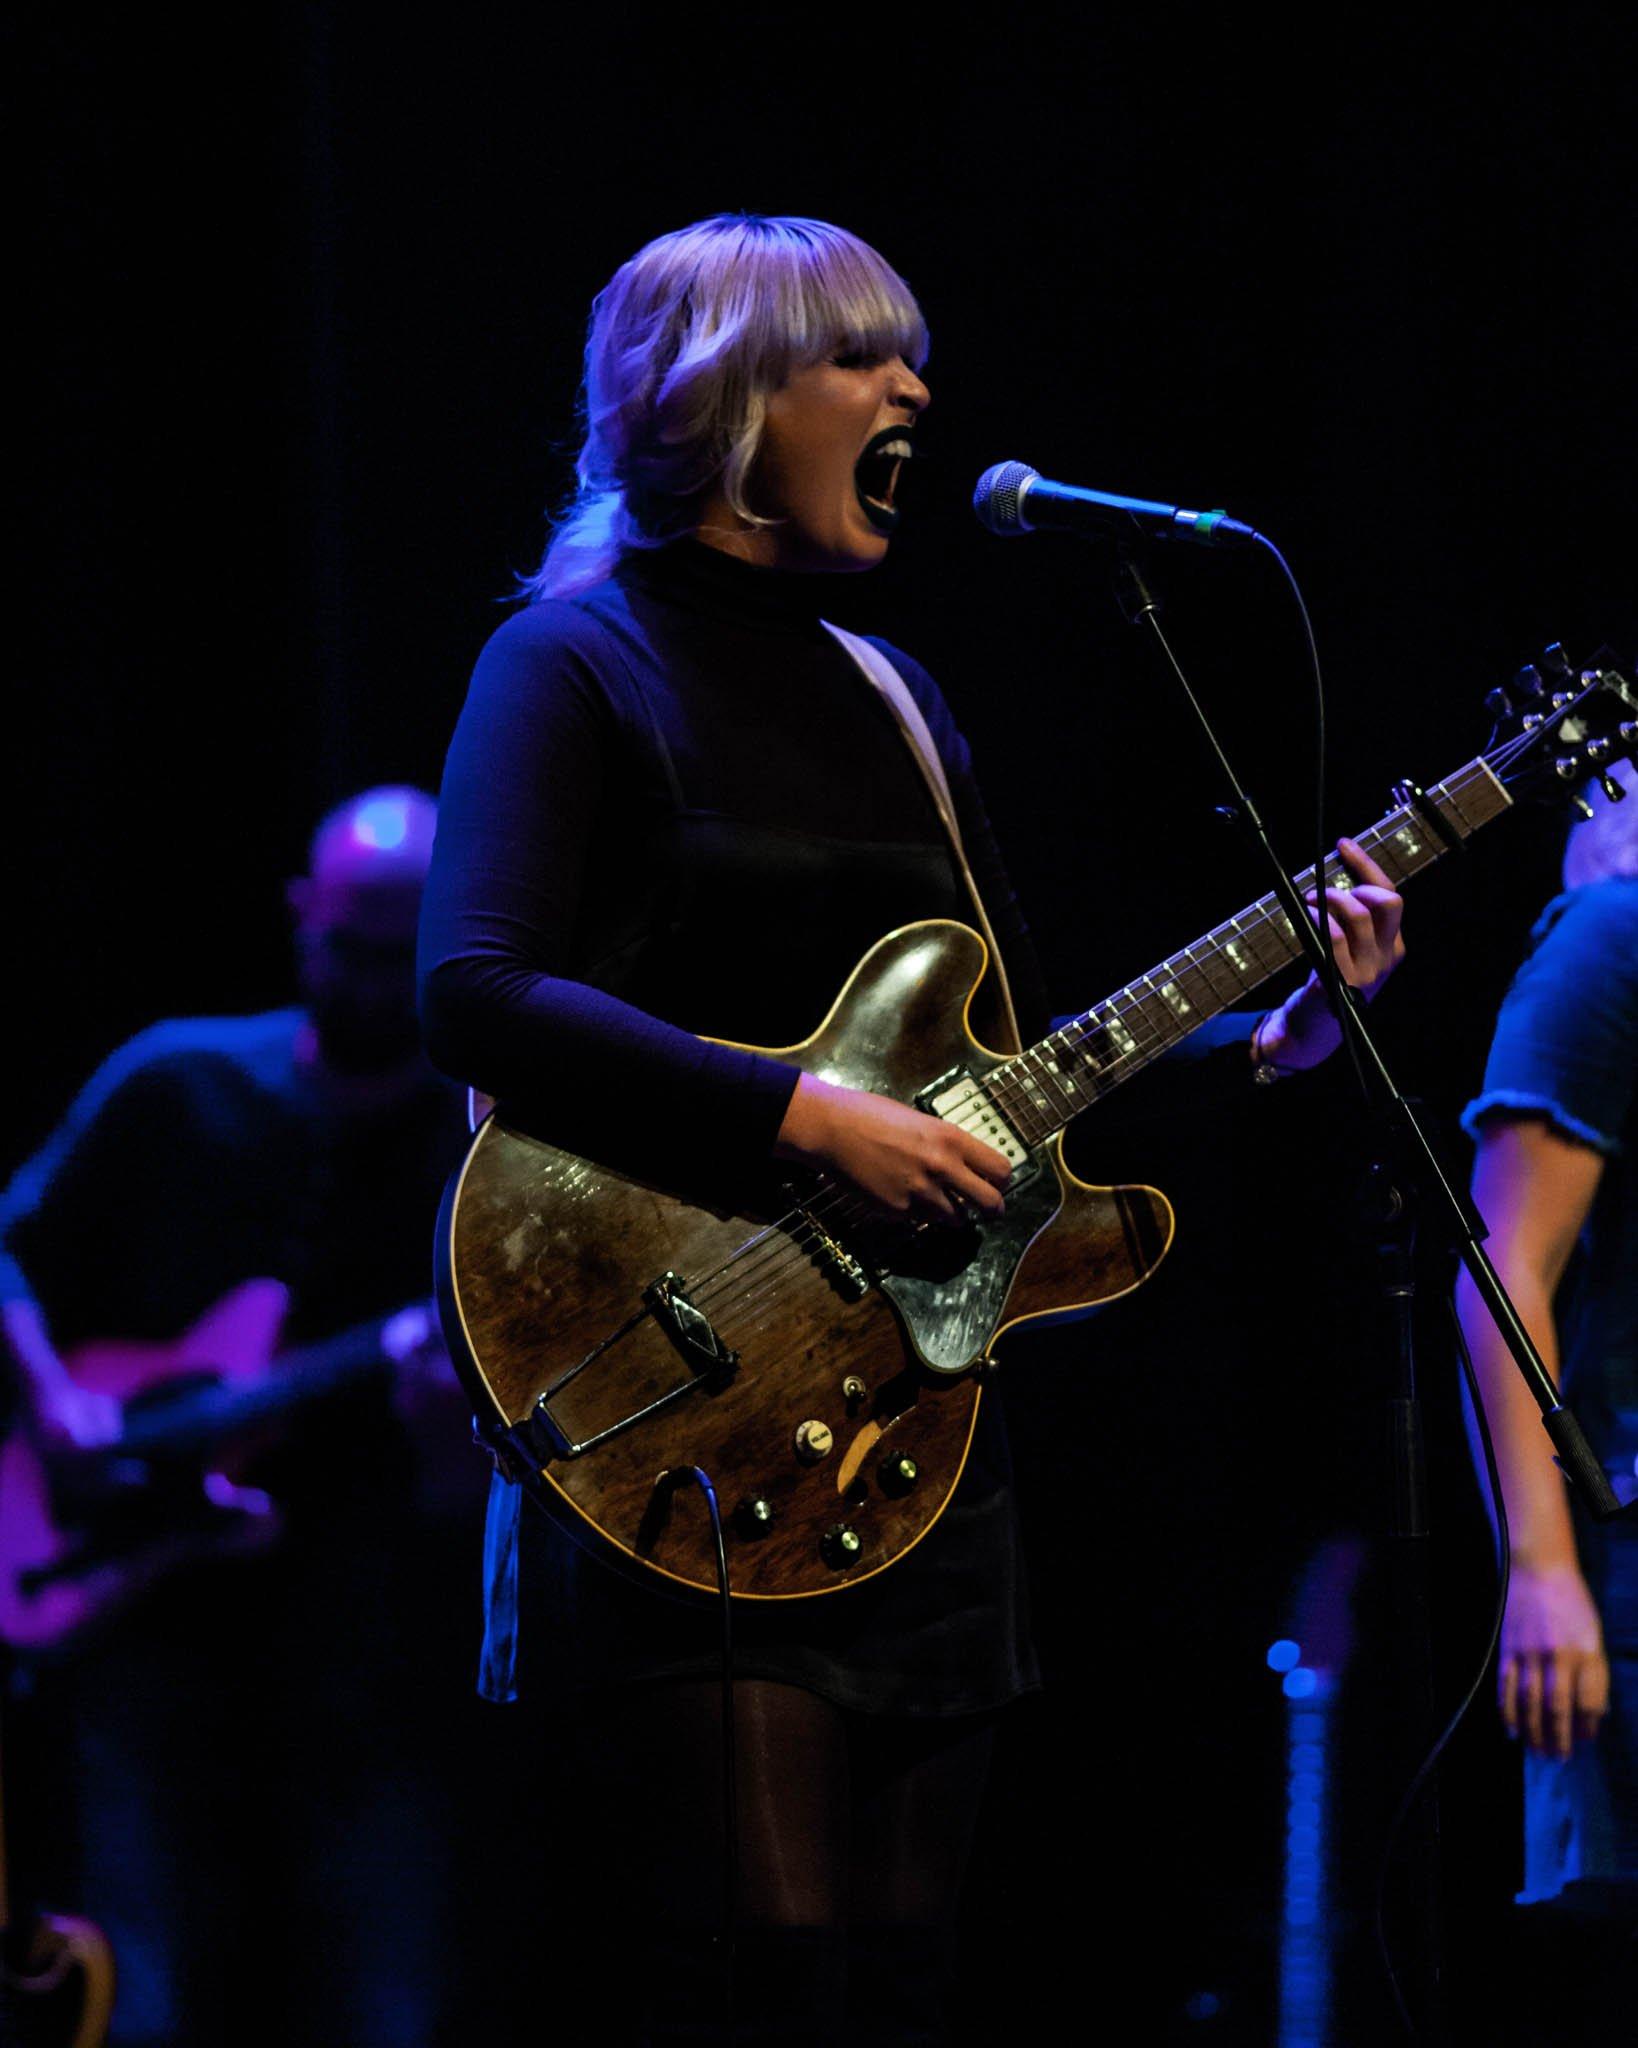 Elizabeth Moen playing at The Englert Theatre in Iowa City